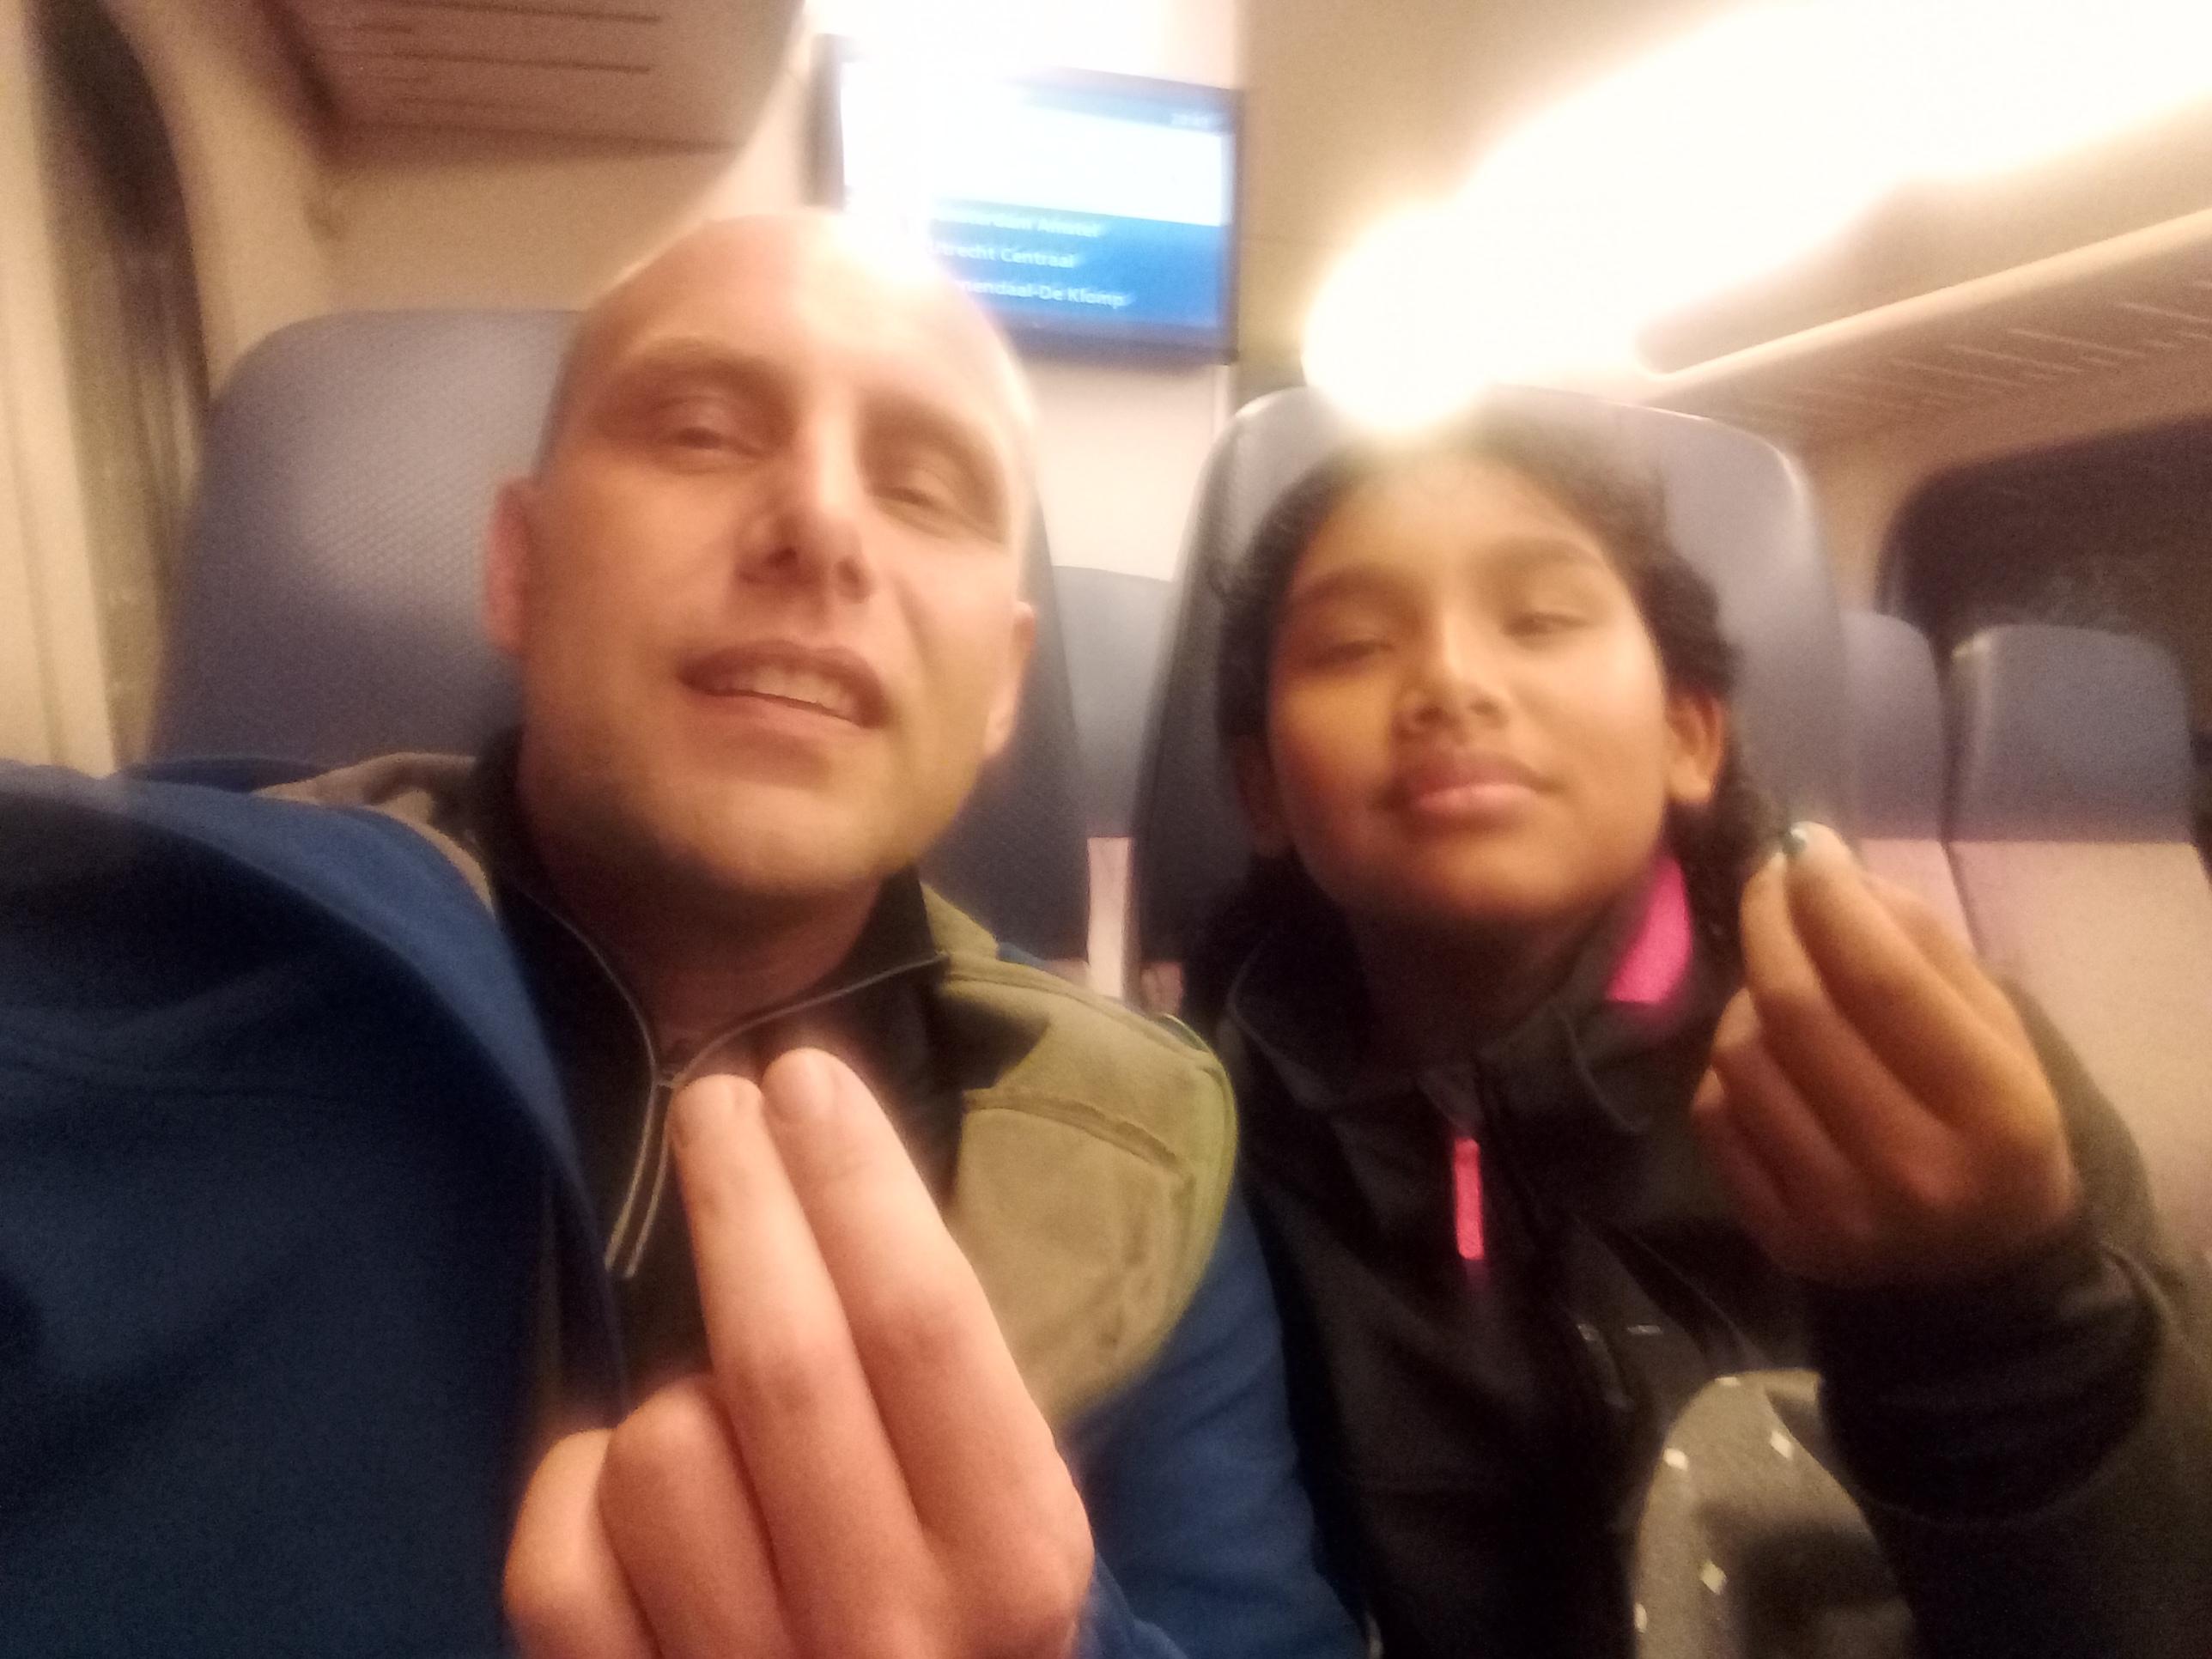 Italian Style in de trein - FamilieNieuws.com